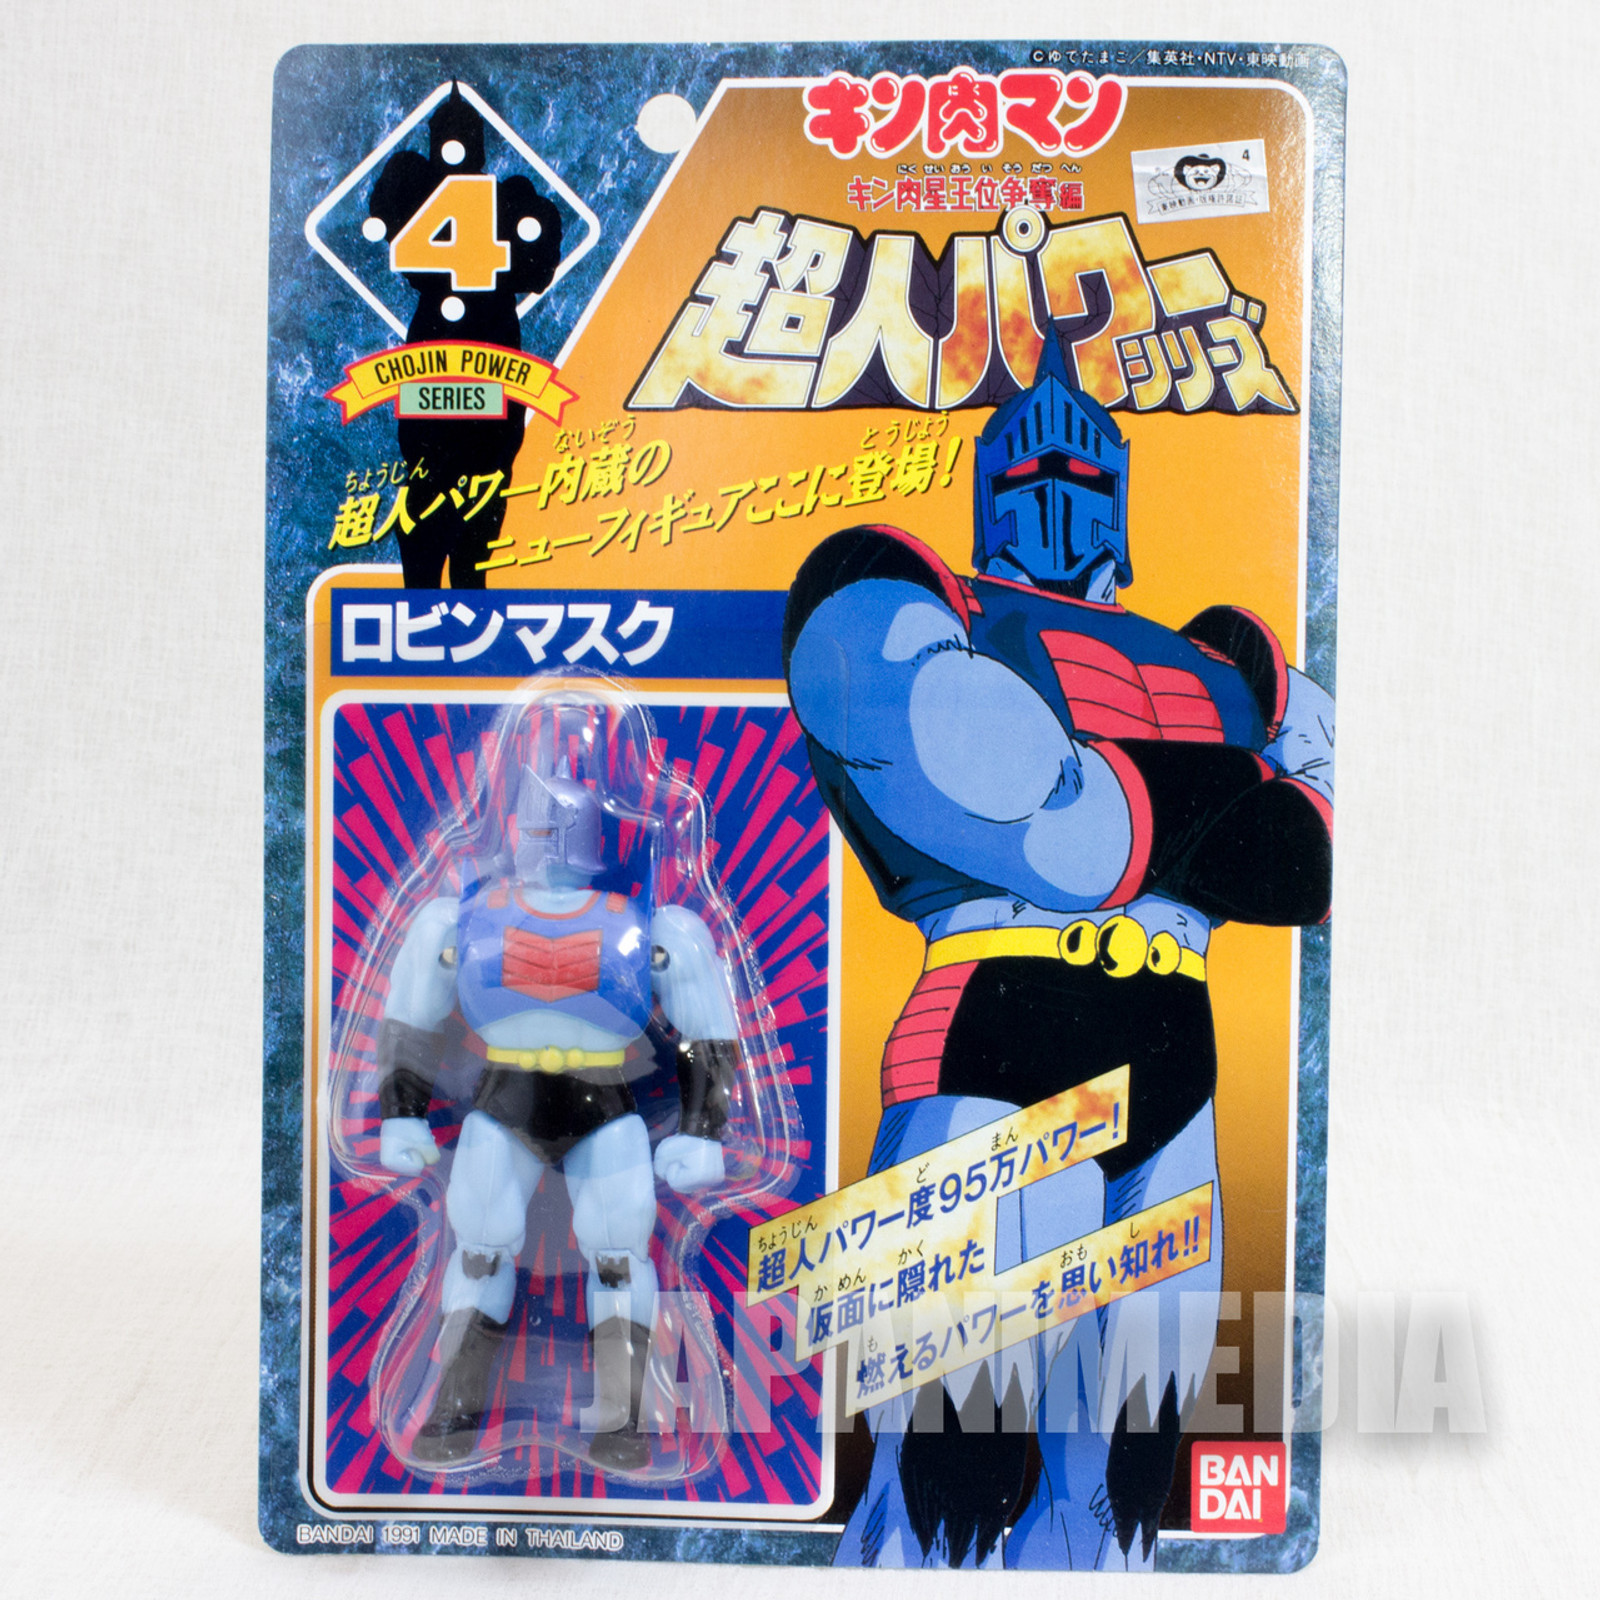 Kinnikuman Robin Mask Figure Chojin Power Series BANDAI JAPAN ULTIMATE MUSCLE